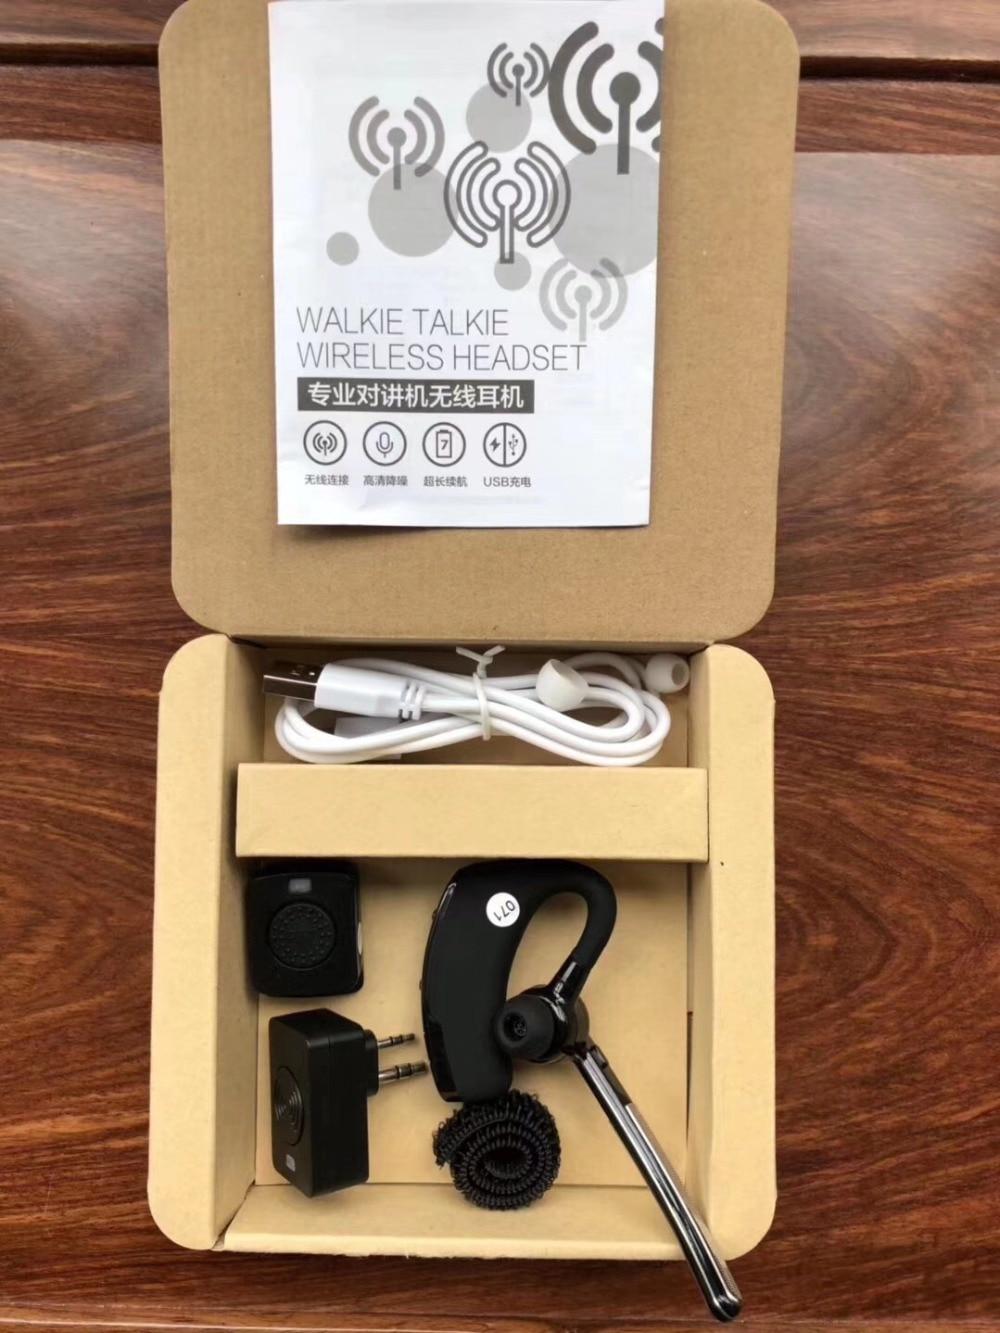 Hands-free Bluetooth Auricolare per il Walkie Talkie TK port trasduttore auricolare senza fili Moto HF PTT Auricolare per Motorola BaoFeng kenwood